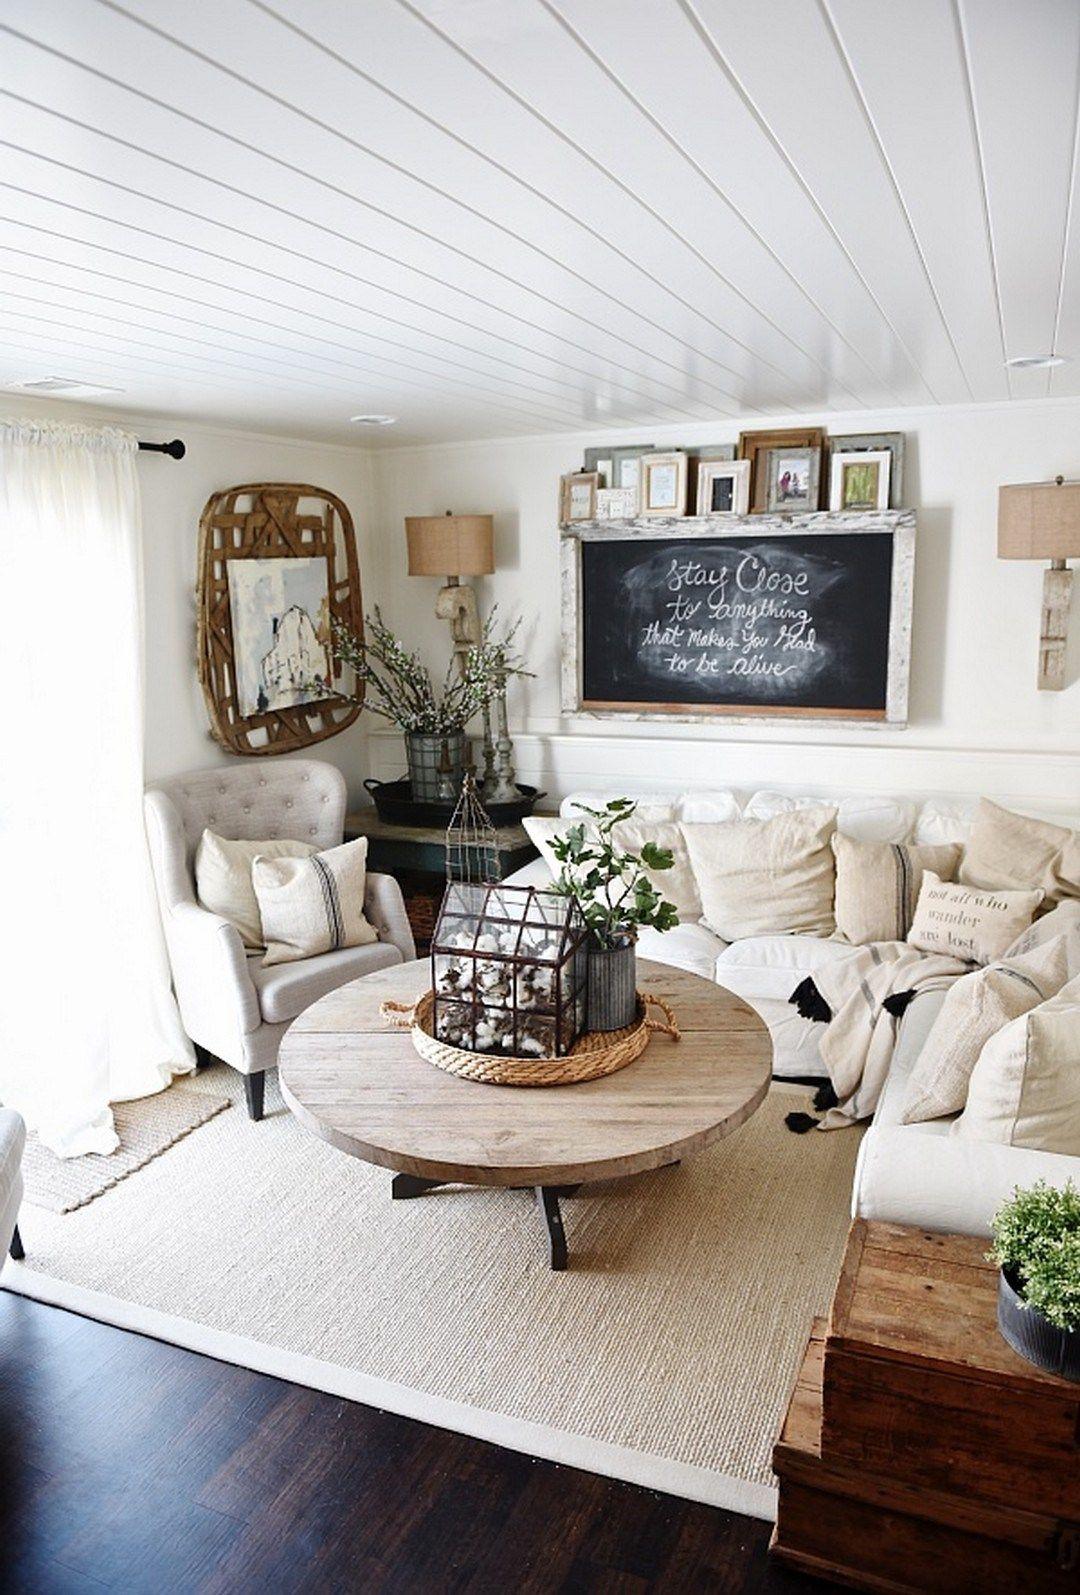 99 DIY Farmhouse Living Room Wall Decor And Design Ideas 35